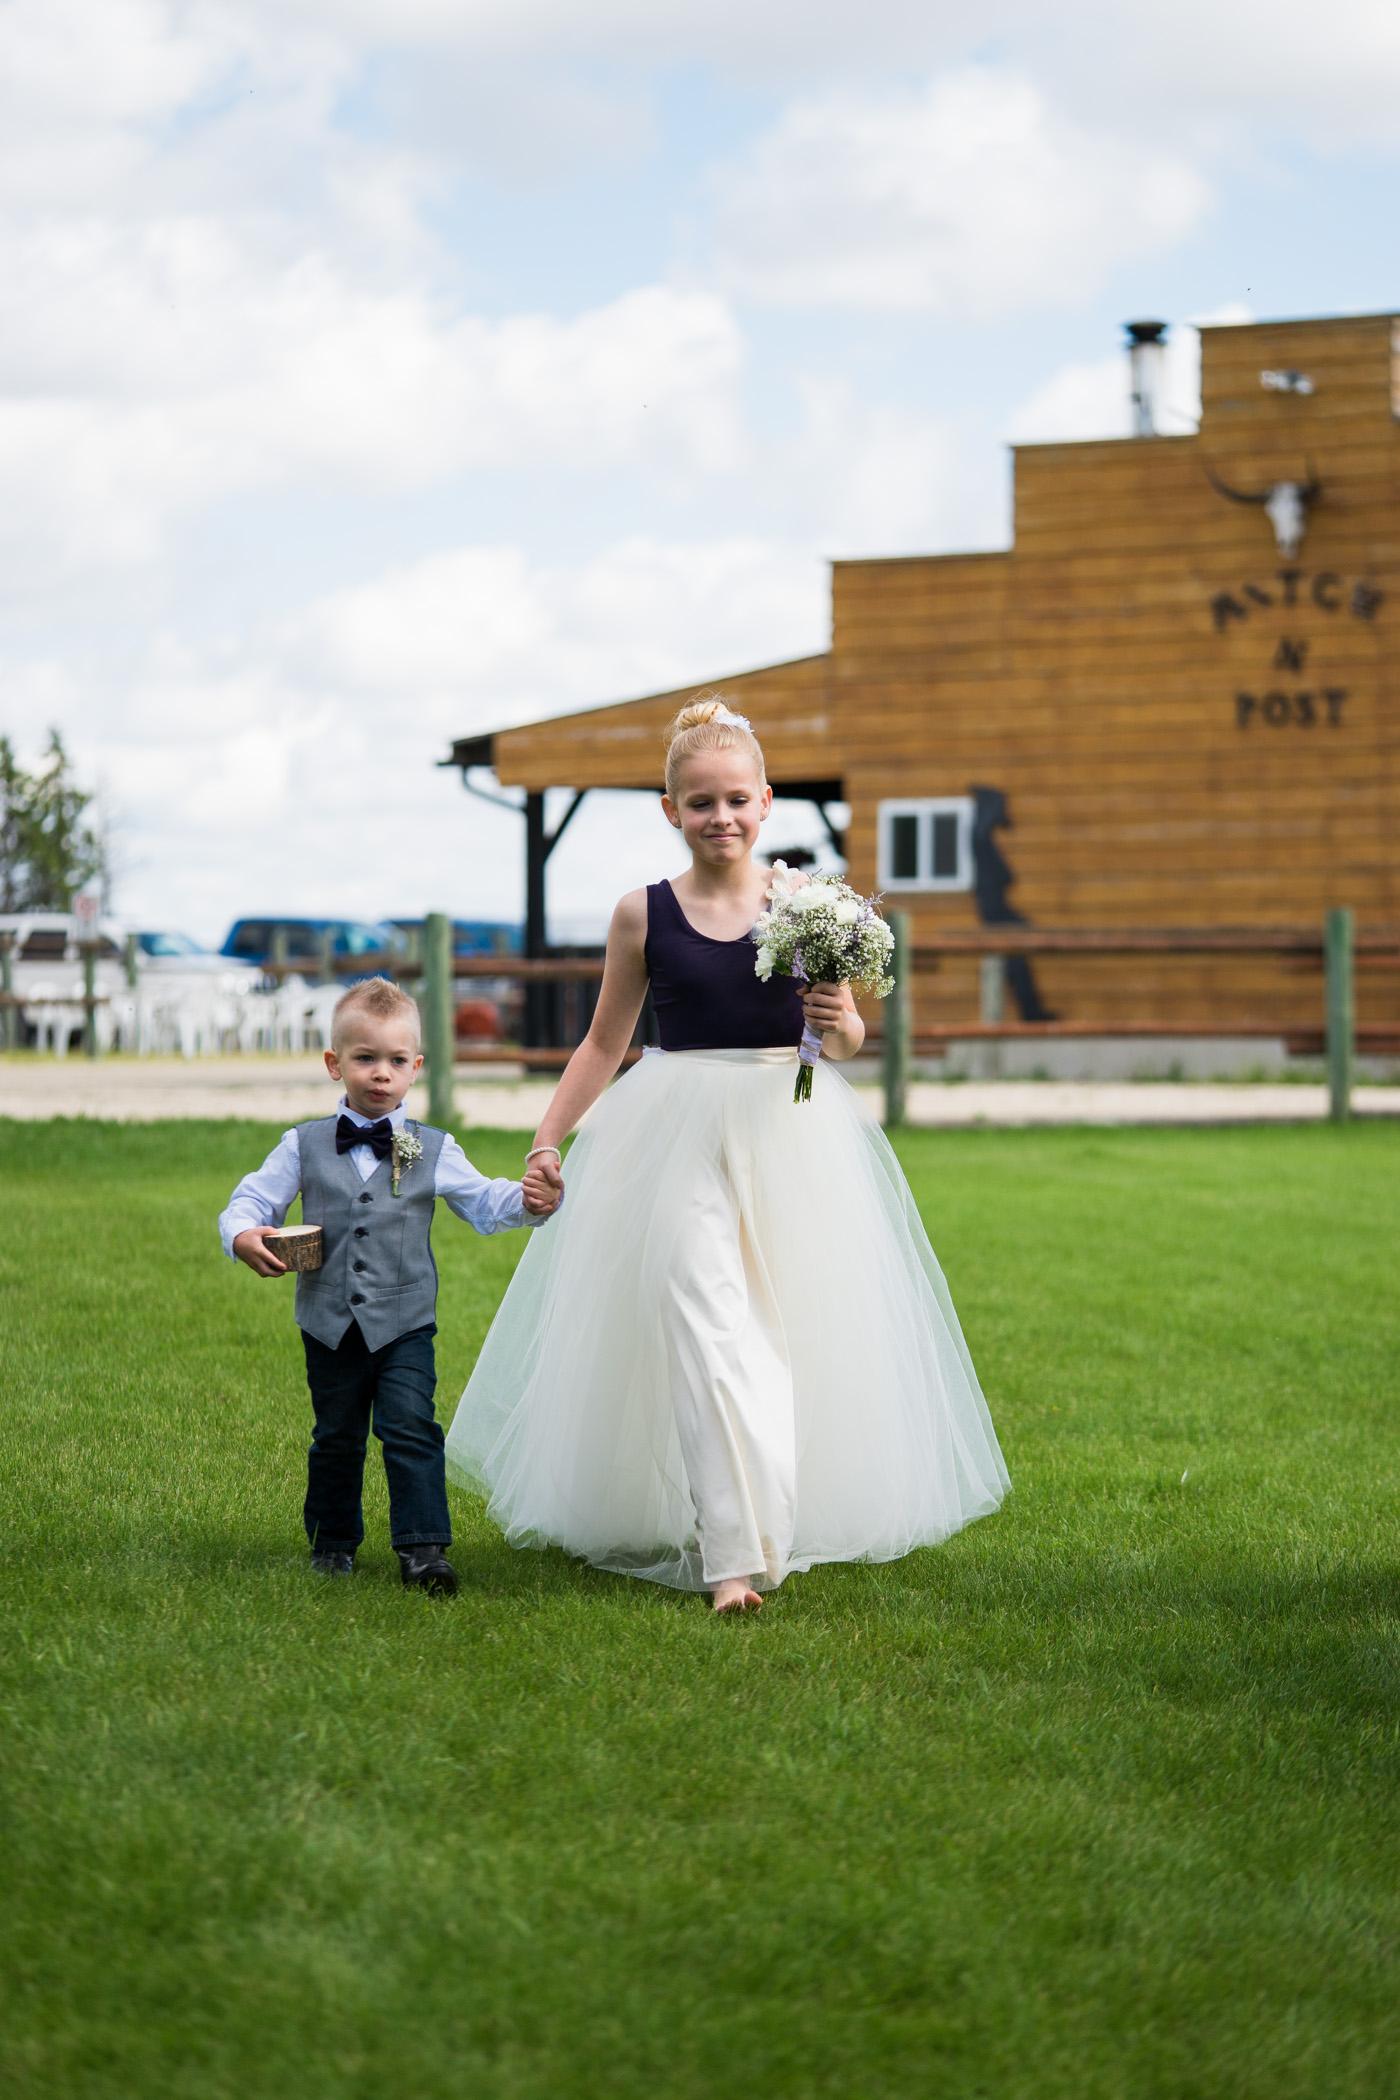 COJO Photo - Whitney and Steve - Wedding-1211.jpg